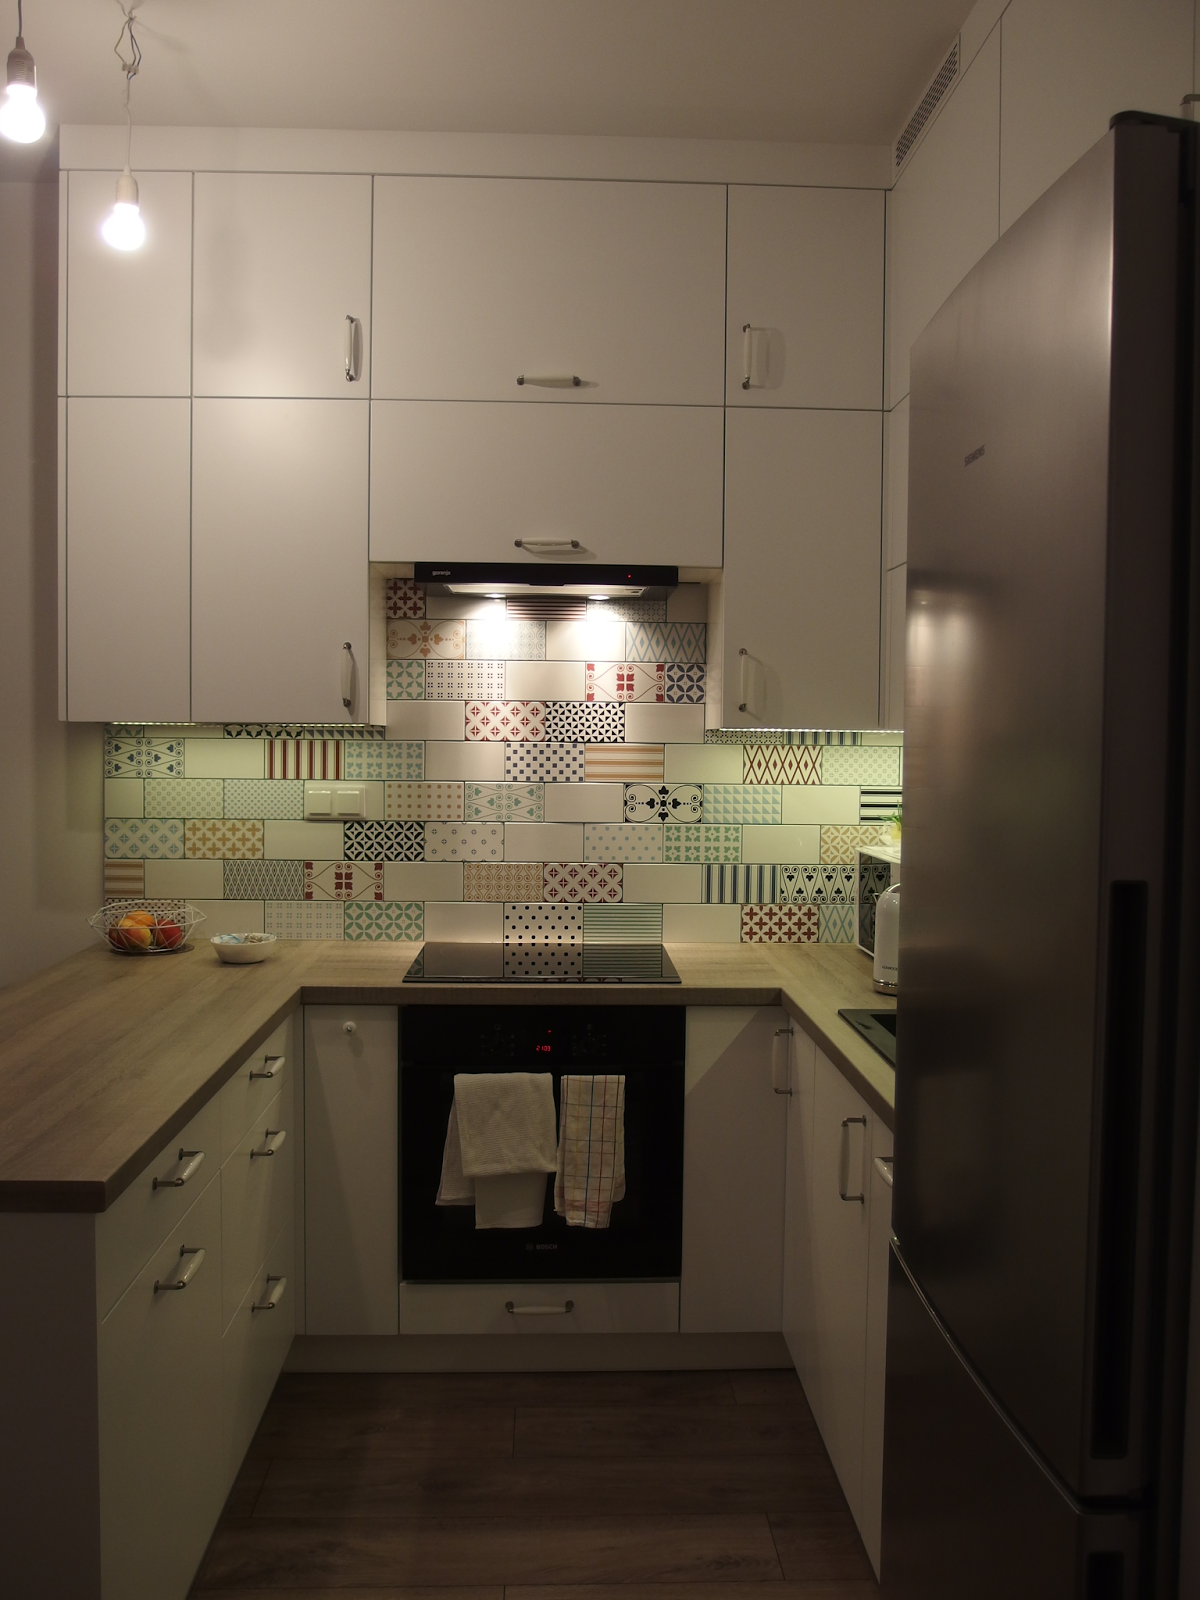 Salon Z Aneksem Kuchennym Biale Meble Kolorowe Plytki Cegielki Patchwork Small Interior Kitchen Cabinets Kitchen